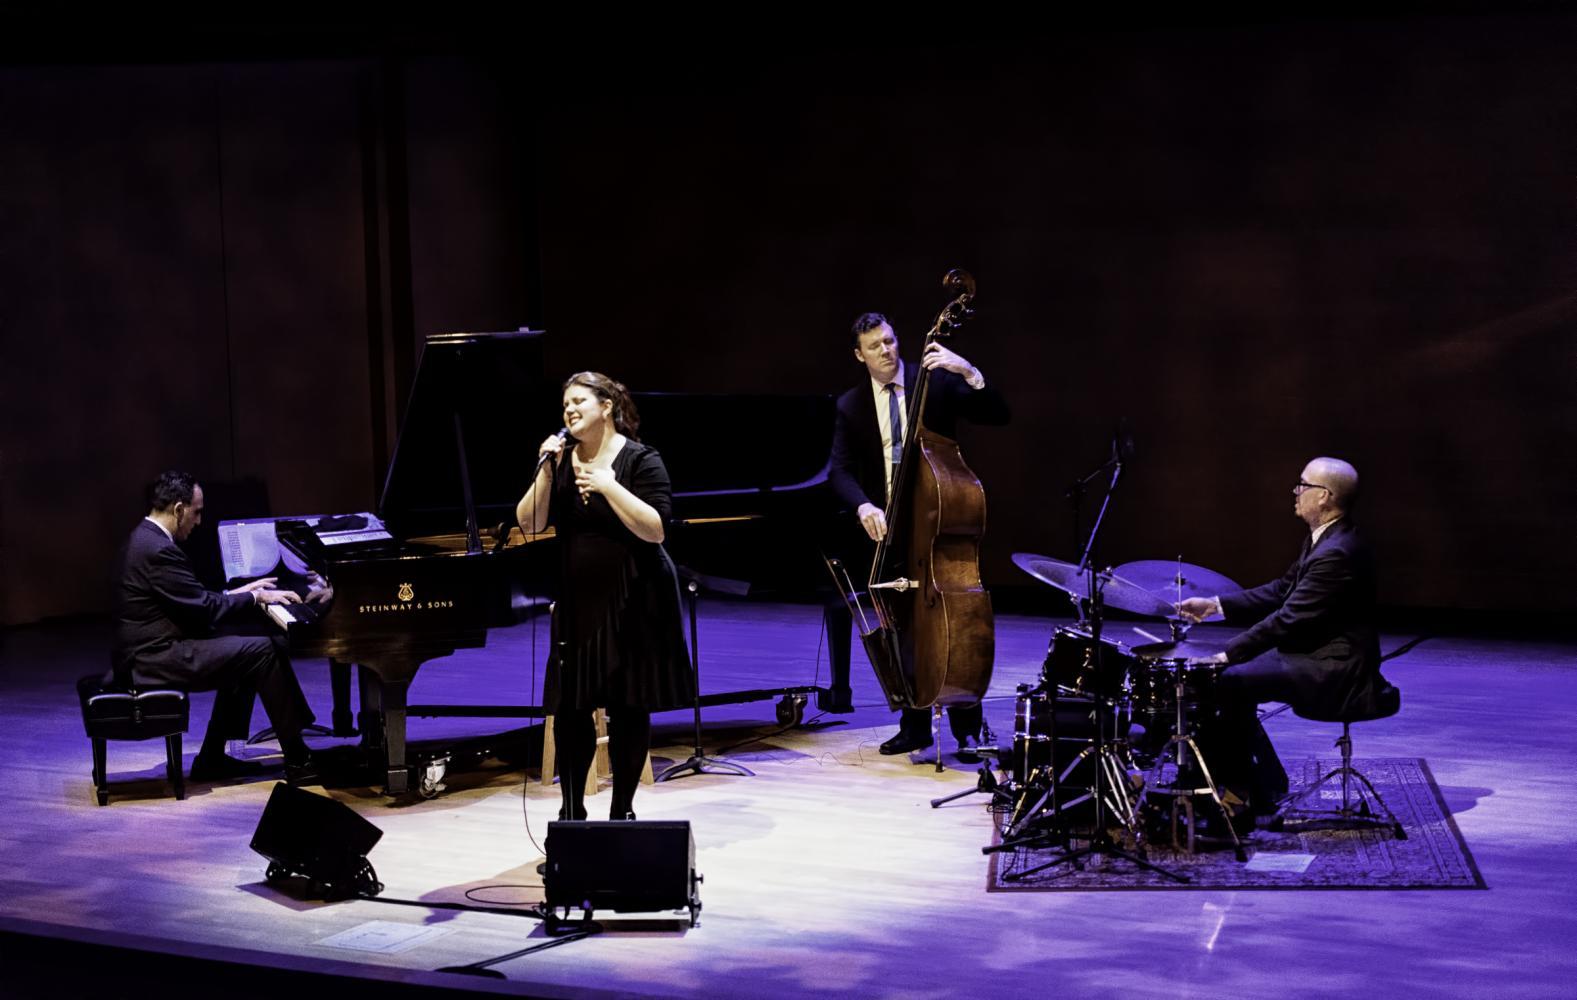 Michael Kanan, Jane Monheit, Neal Miner And Rick Montalbano At The Musical Instrument Museum (mim) In Phoenix